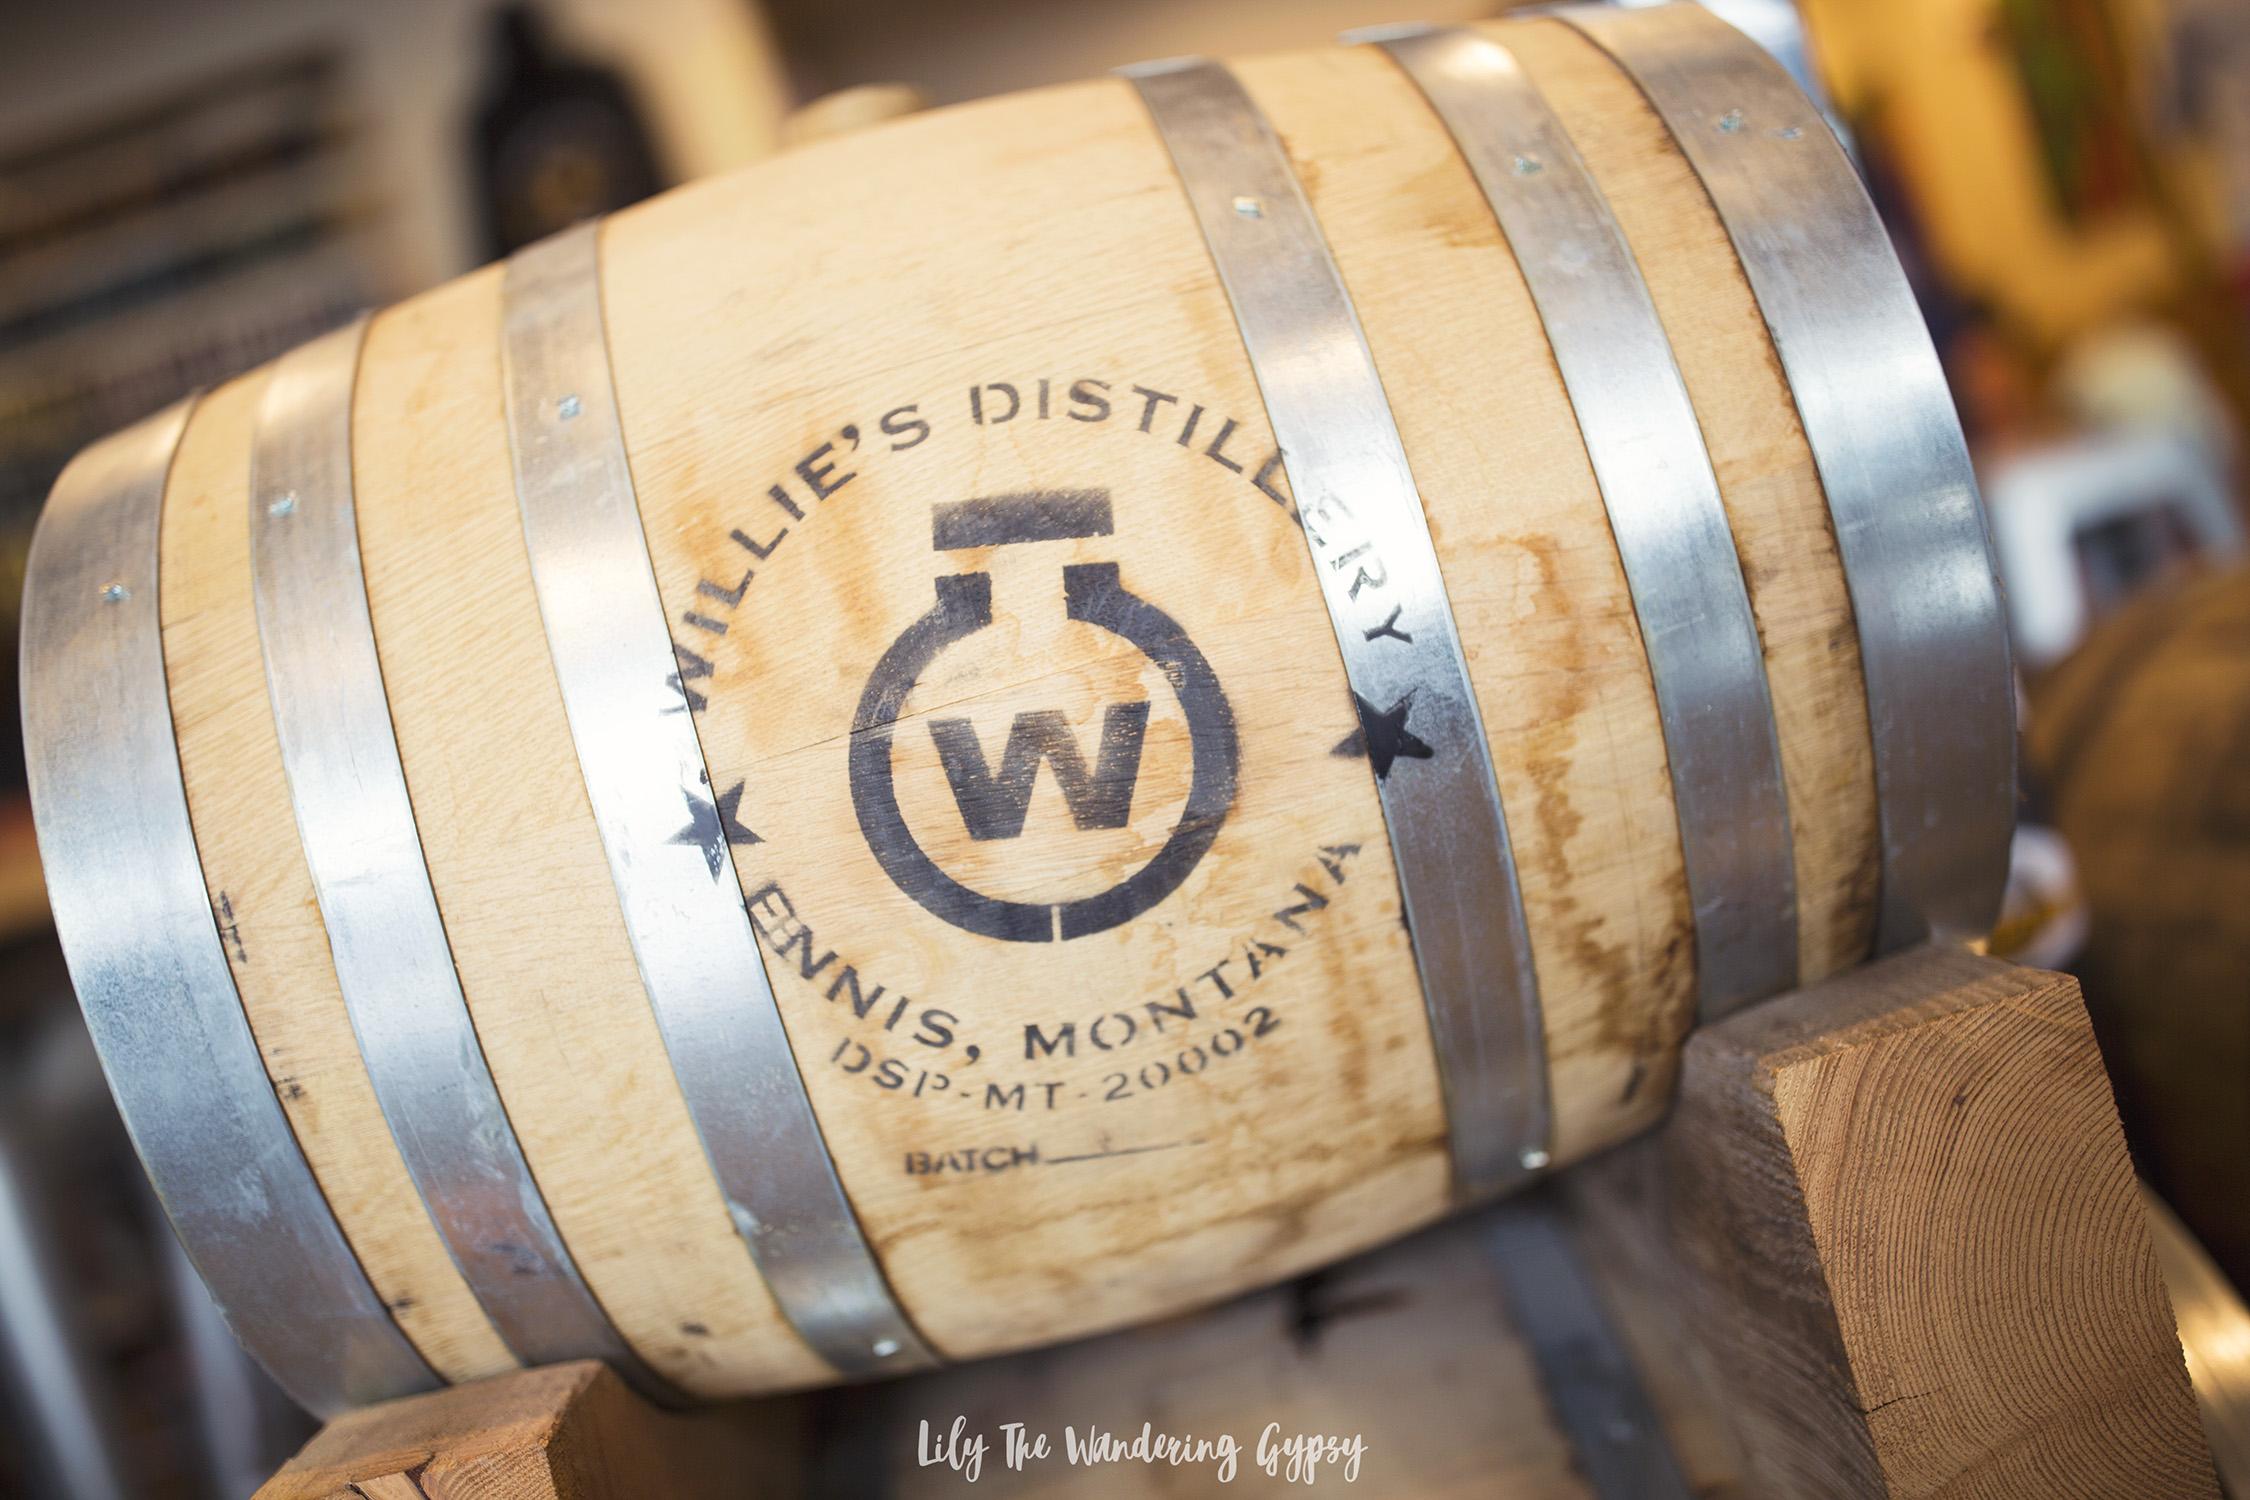 Willie's Distillery Barrel